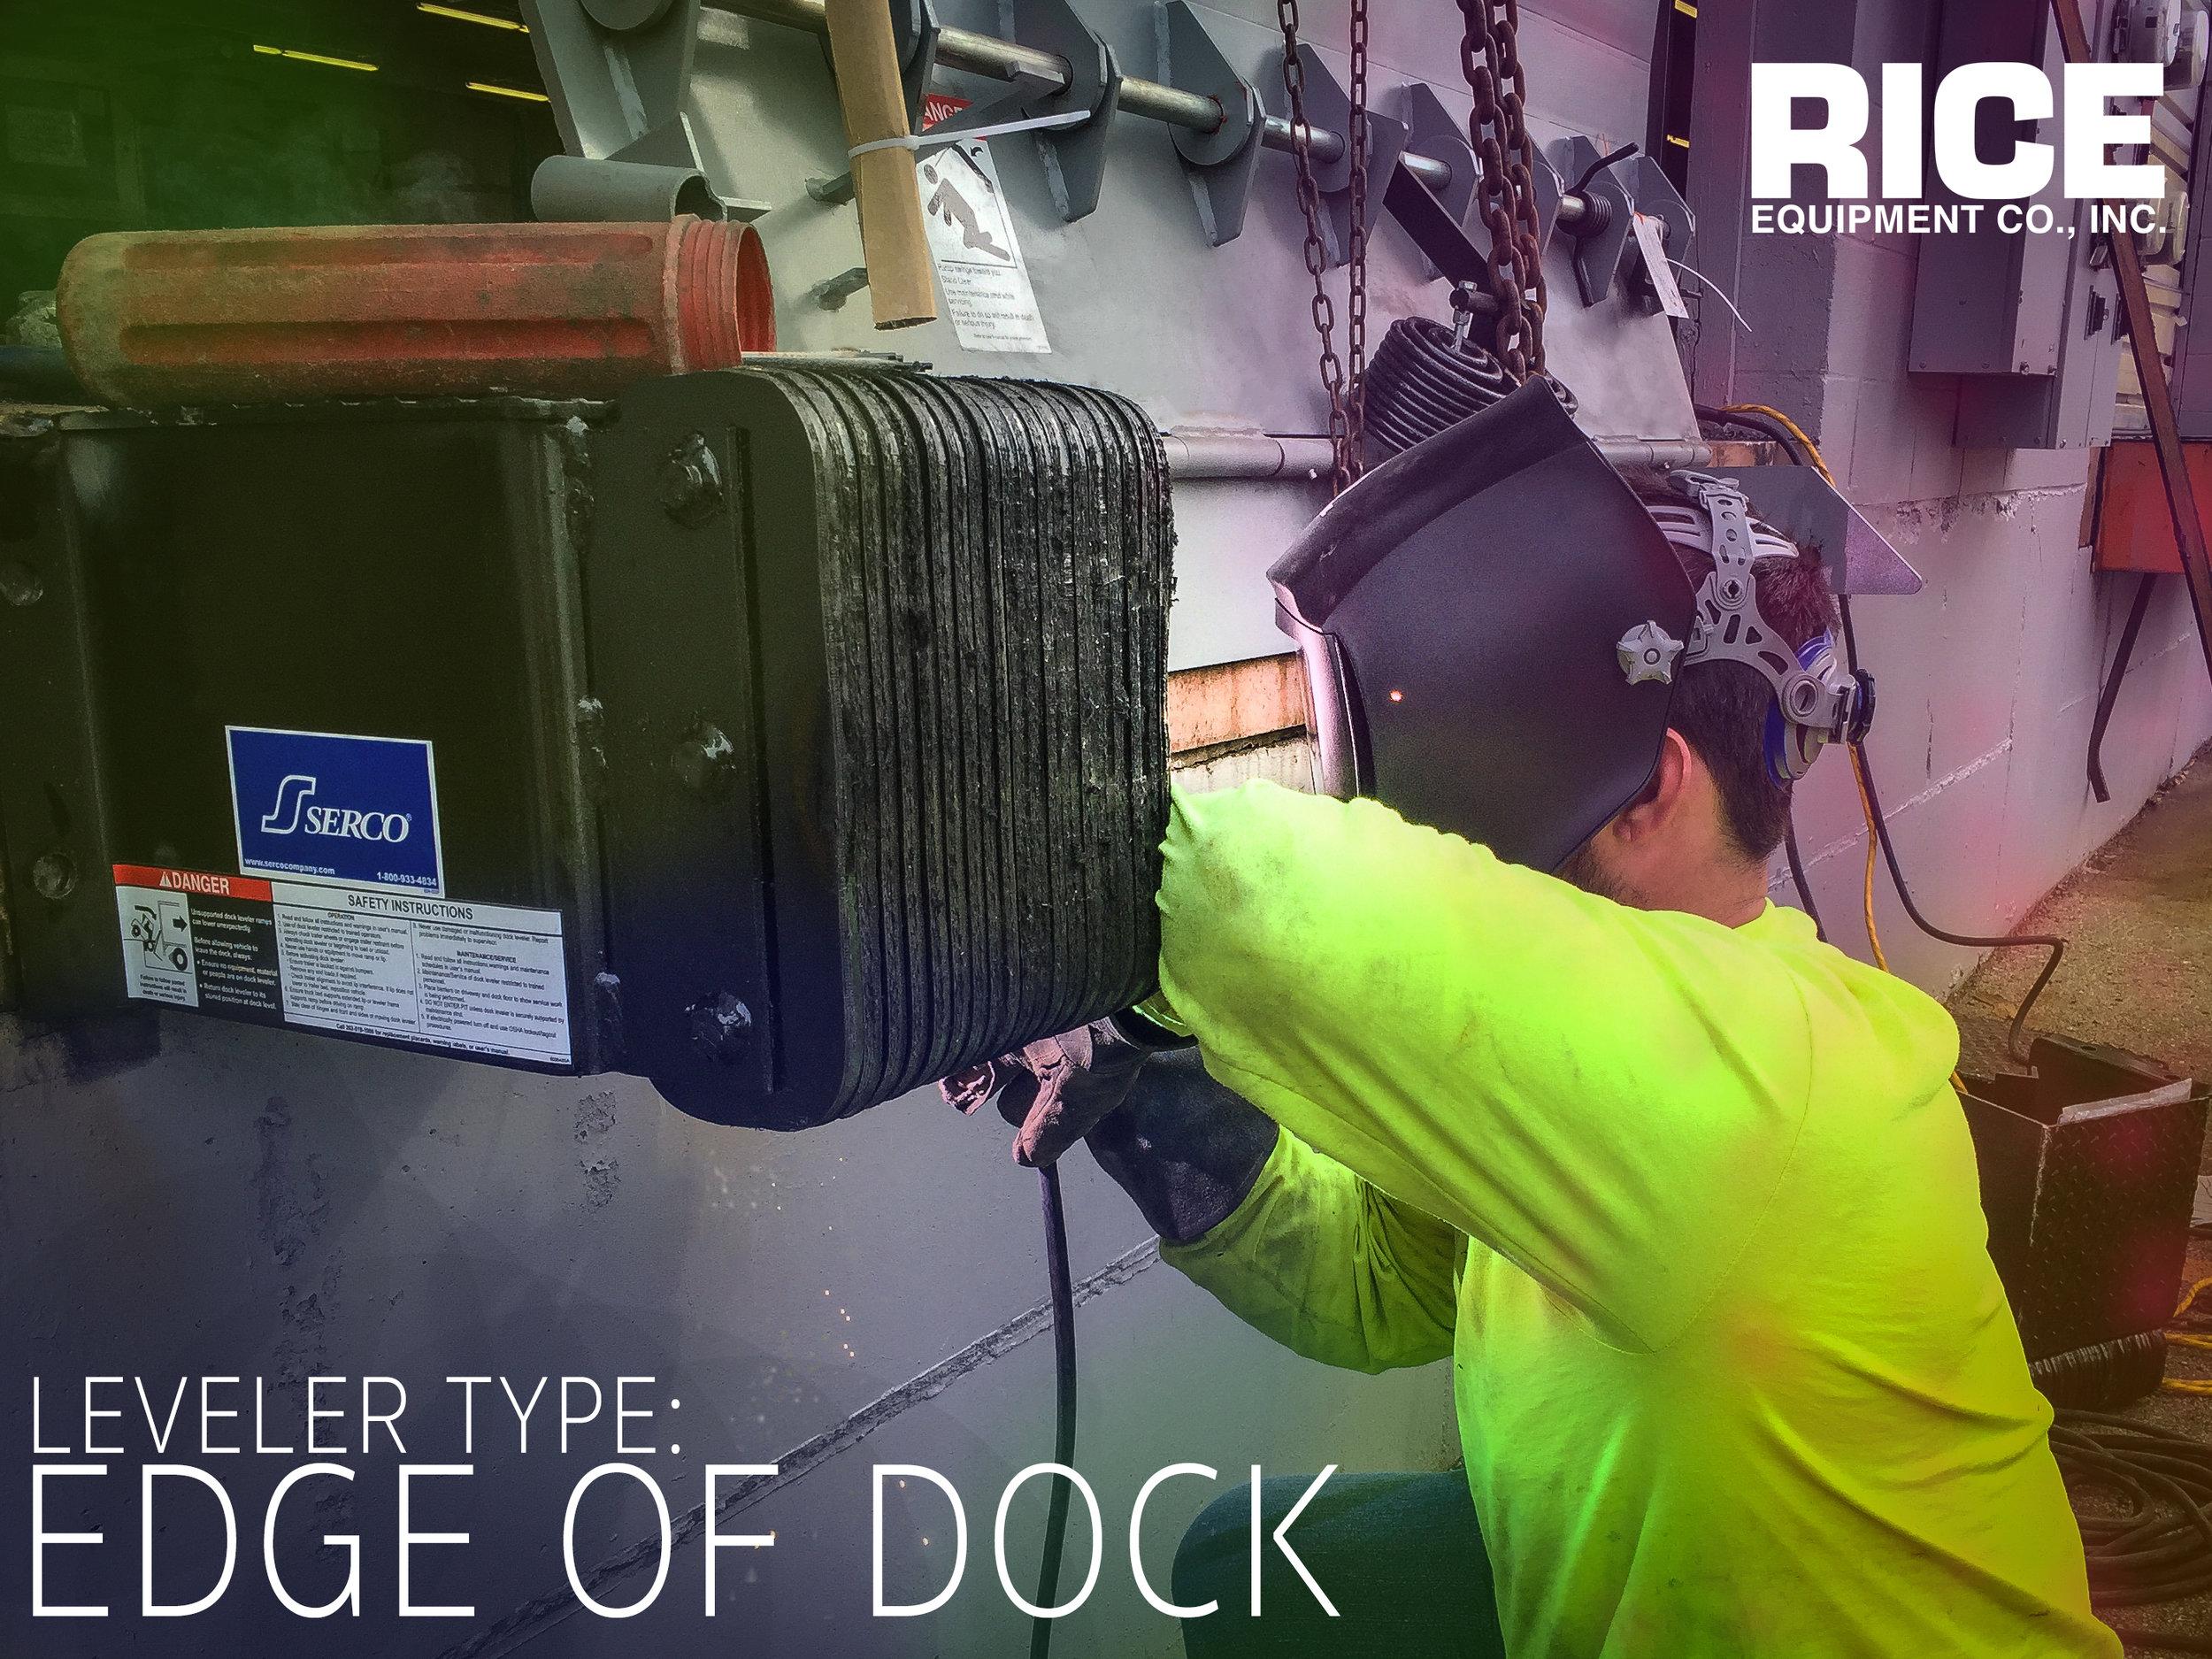 EOD Edge of Dock Leveler Plates Installation and Repair St Louis Missouri - Rice Equipment Bridgeton MO